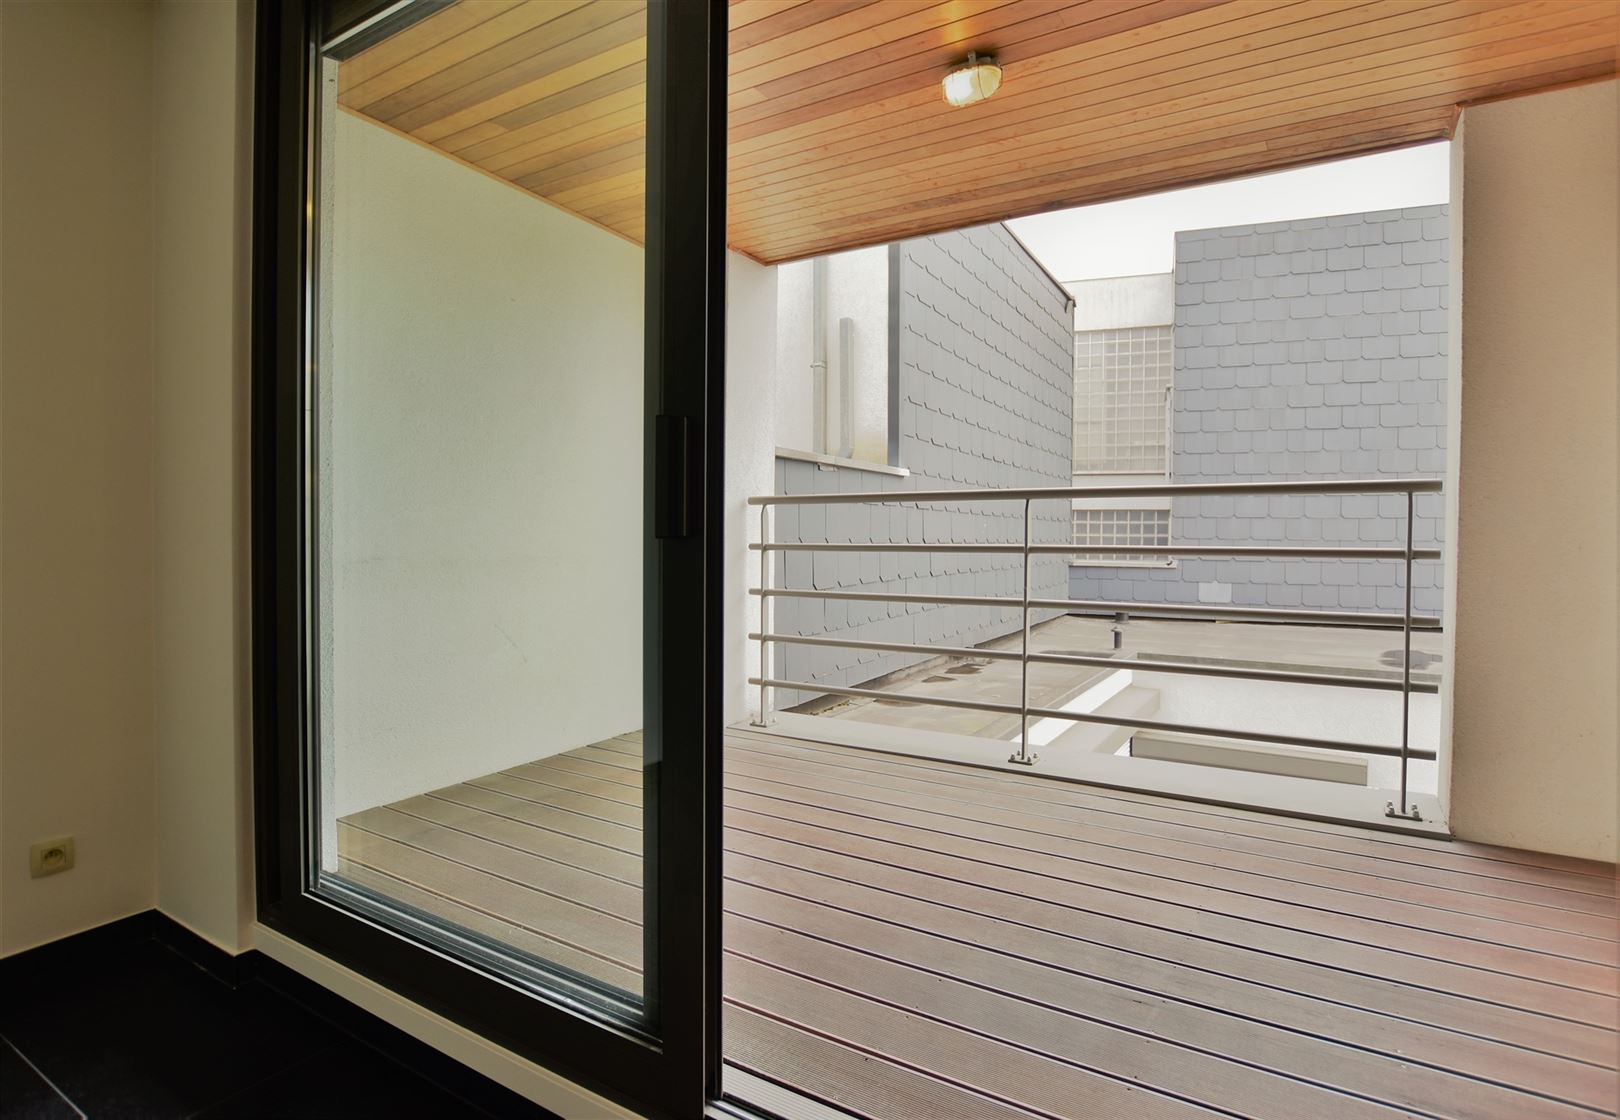 Foto 10 : Duplex/Penthouse te 9200 Sint-Gillis-bij-Dendermonde (België) - Prijs € 278.000